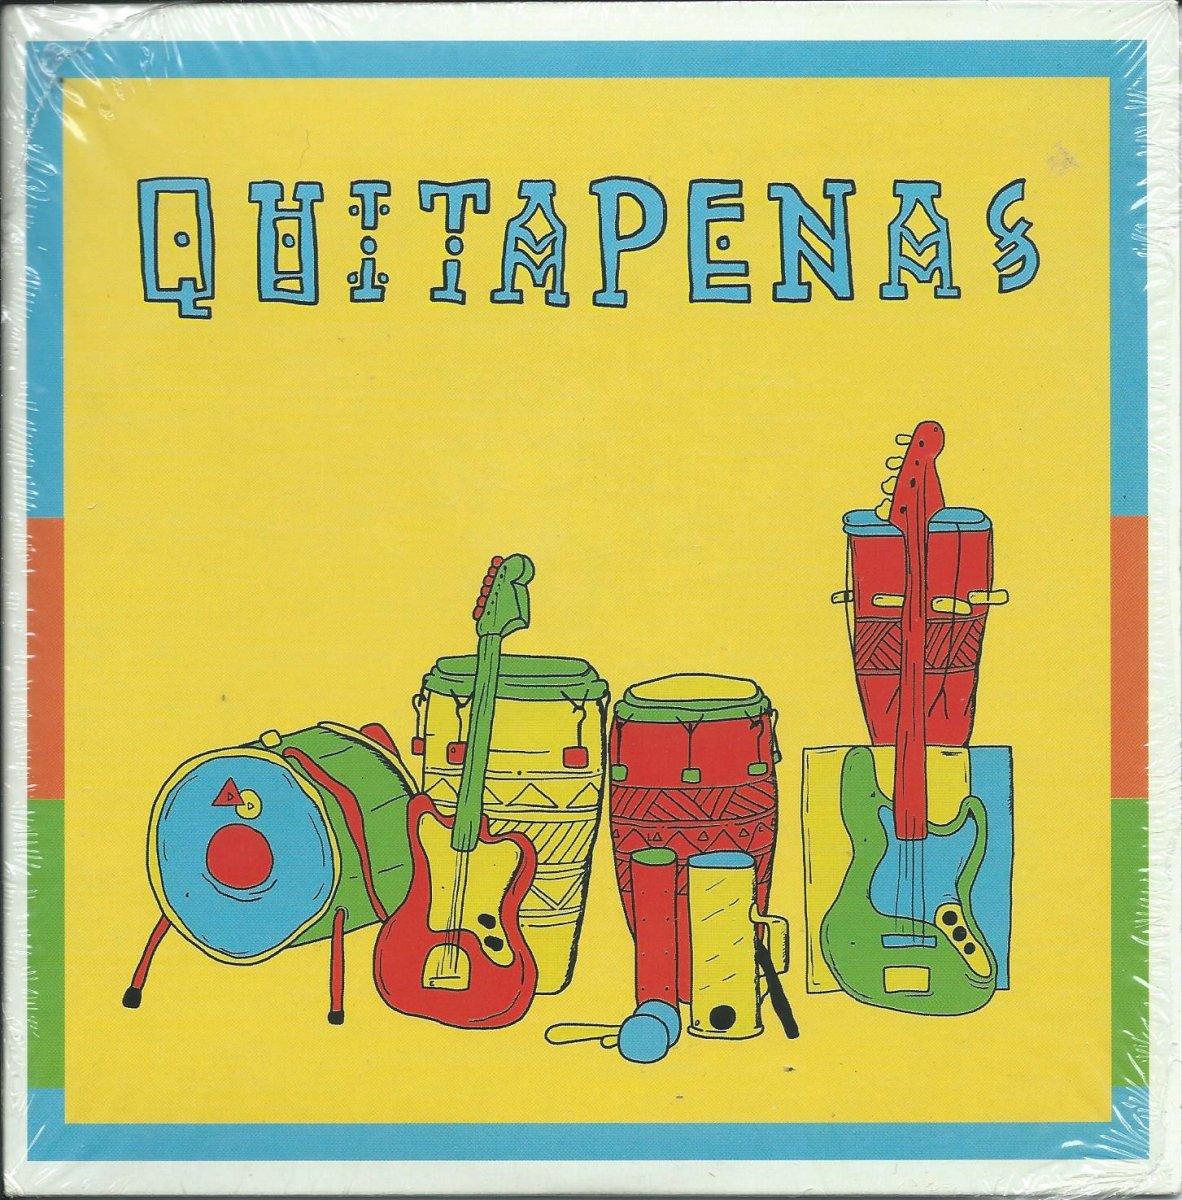 QUITAPENAS / YA VERAN / LA BESTIA (7